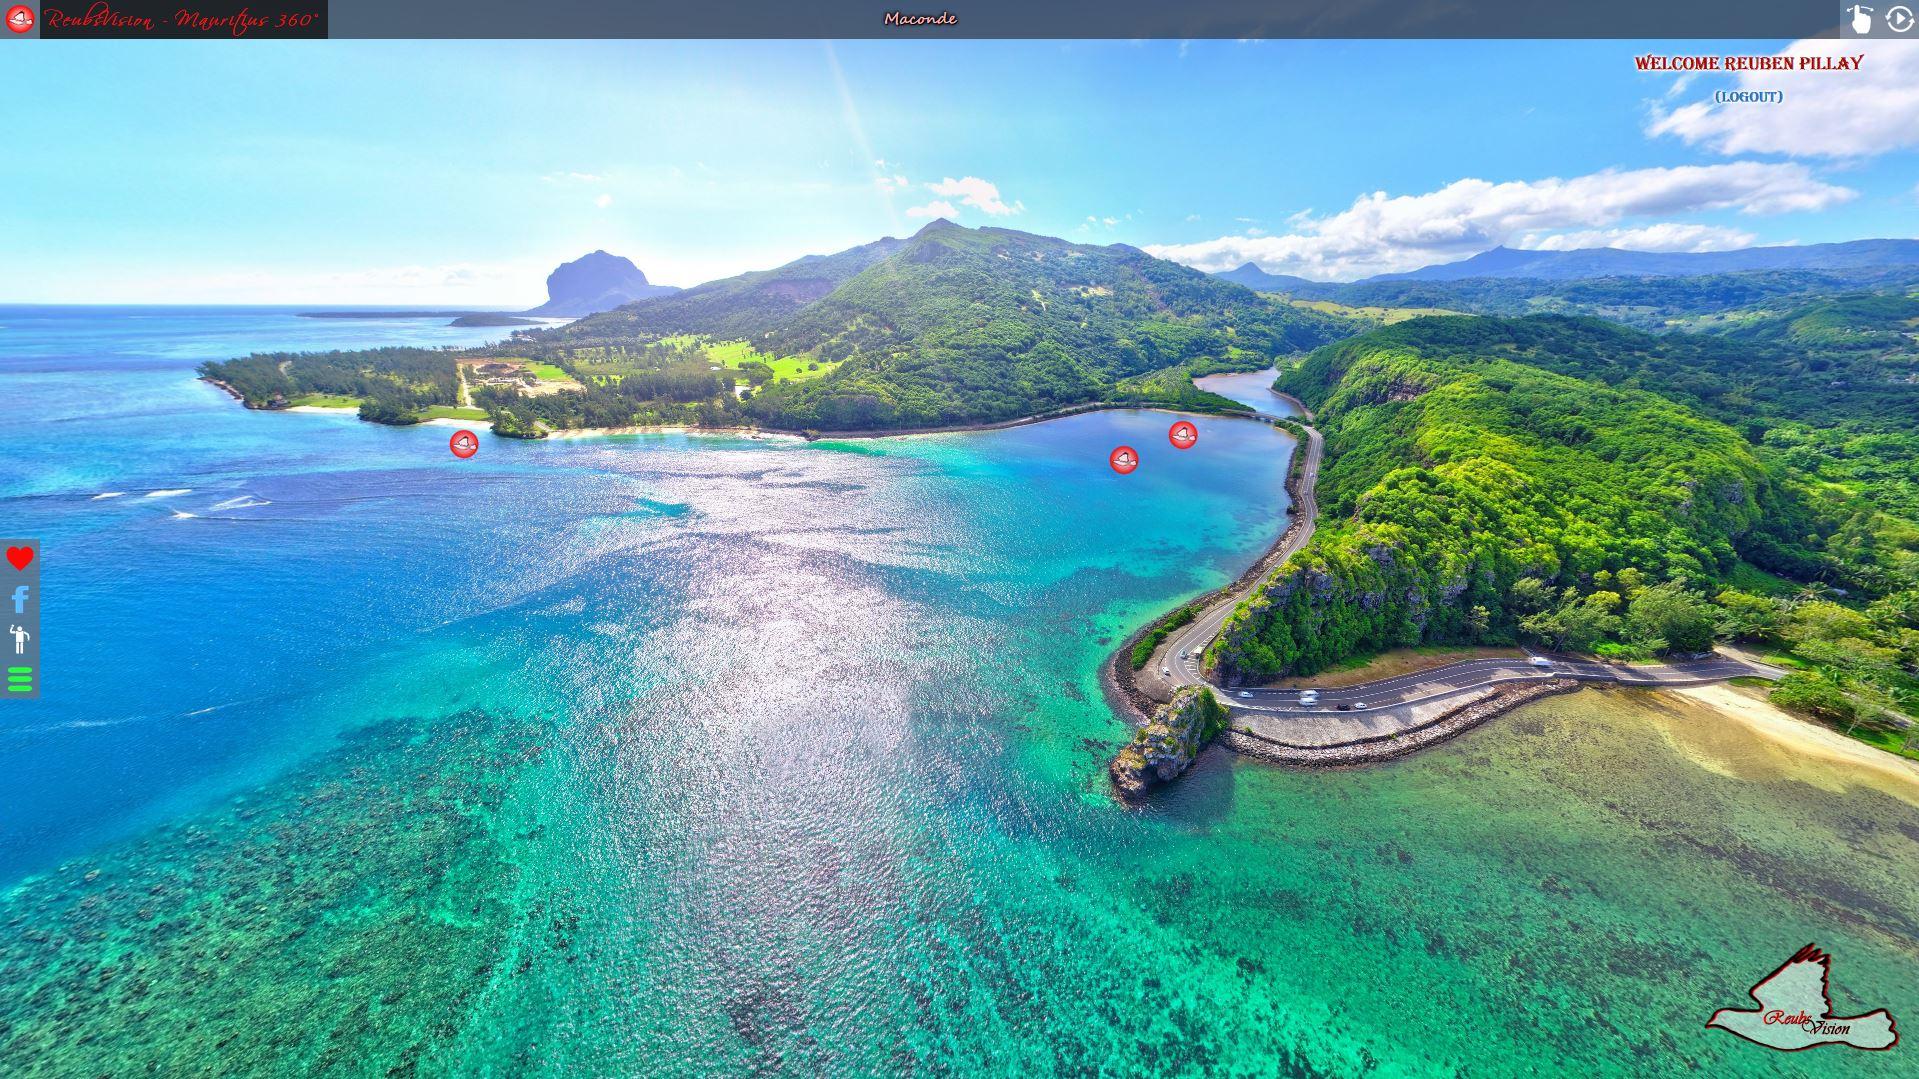 2020-06-26 01_37_42-ReubsVision – Mauritius 360 – Firefox Developer Edition